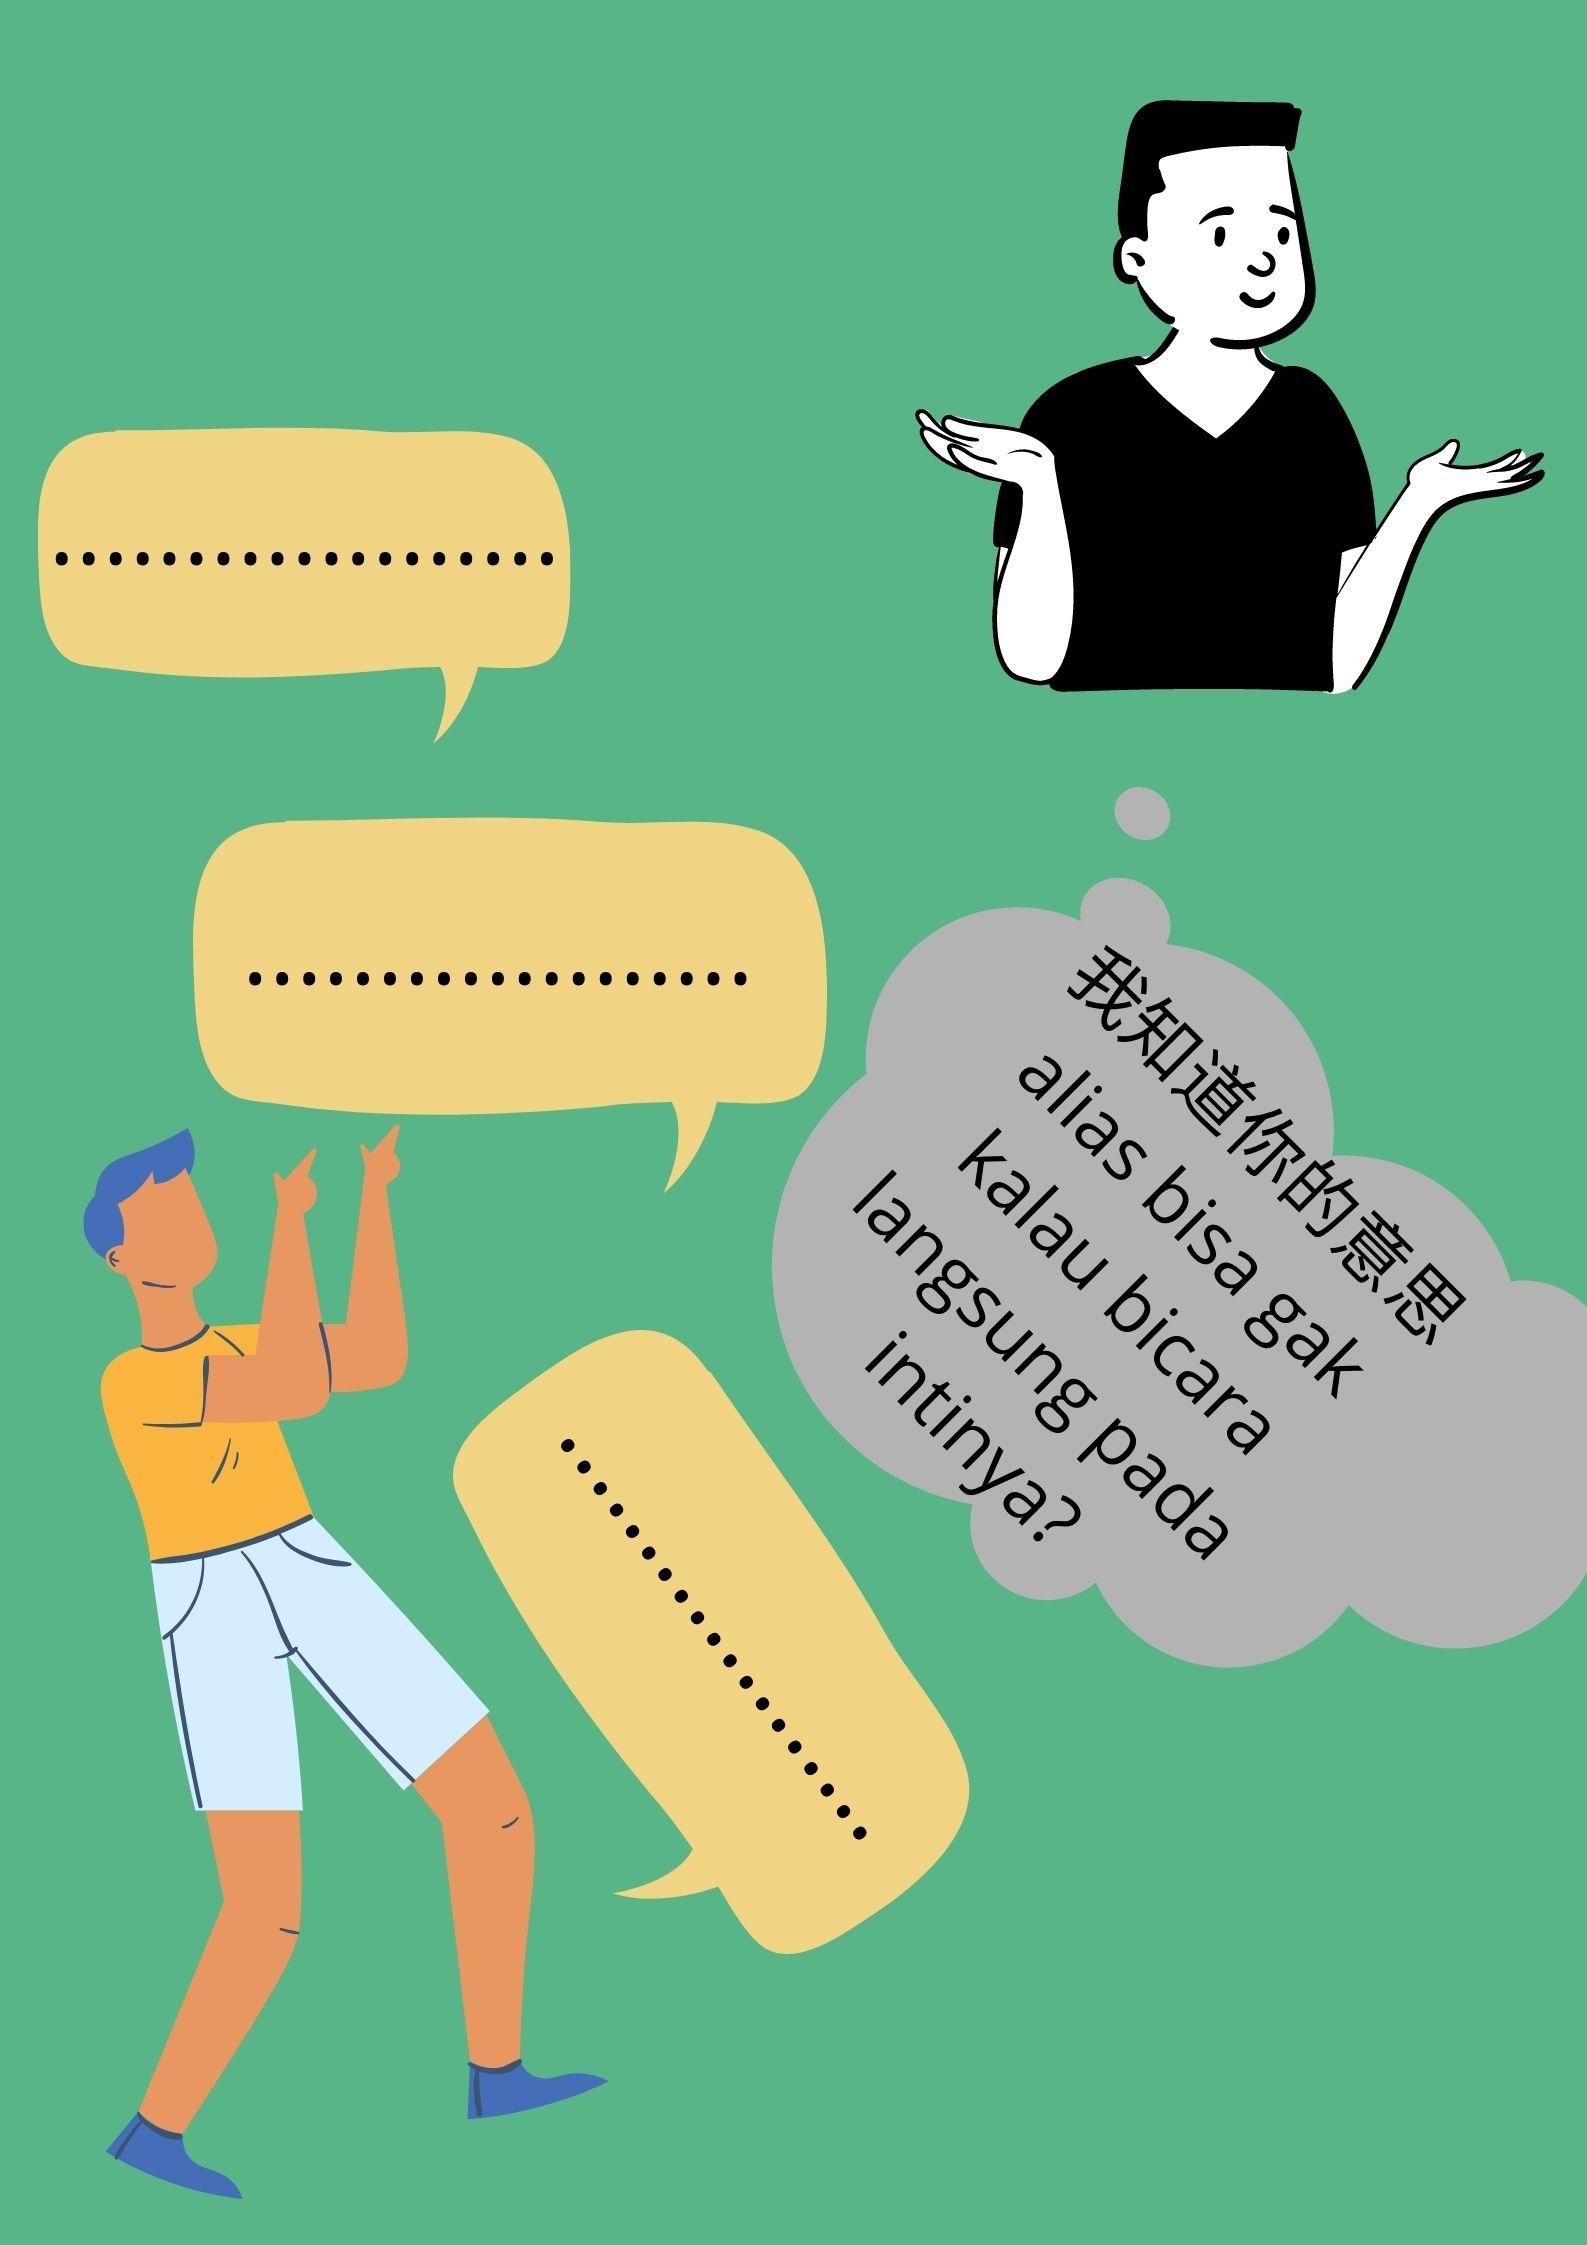 Ilustrasi dari makna peribahasa开门见山dibacakāi mén jiàn shānyang sering dijumpai dalam kehidupan bermasyarakat. Sumber: Dokumentasi Penulis